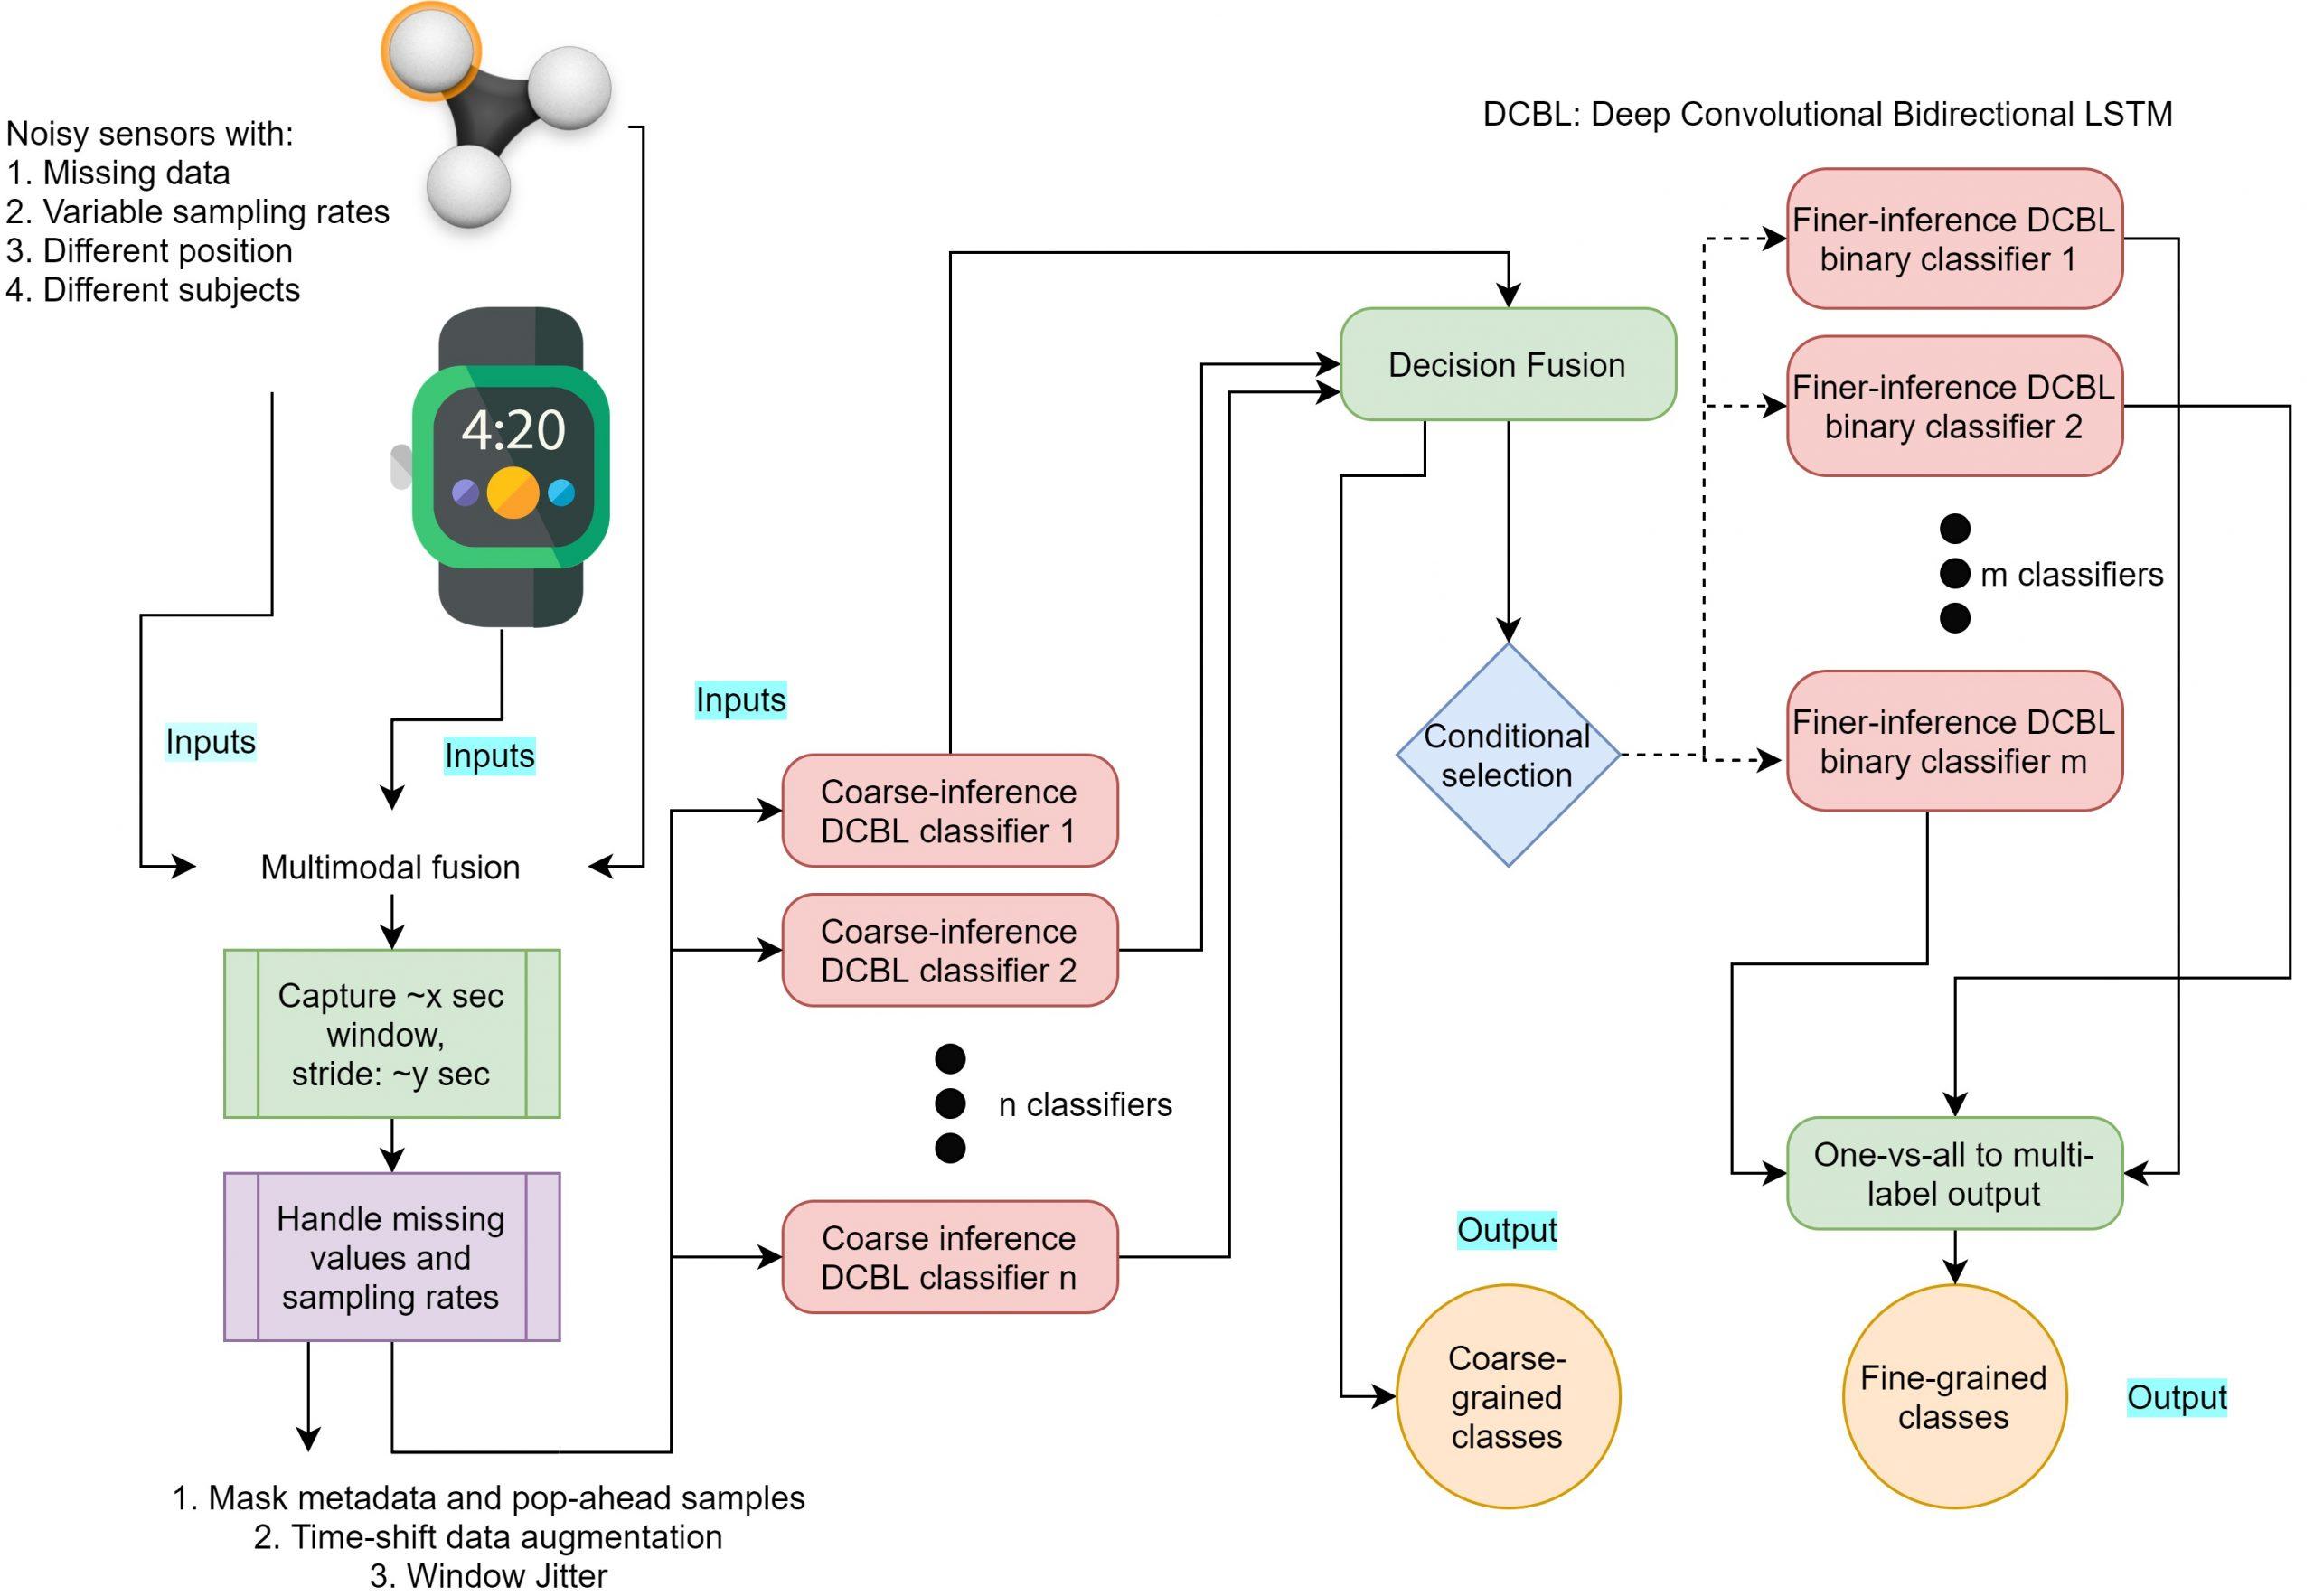 Robust Deep Learning Pipeline in the Presence of Runtime Sensing Uncertainties